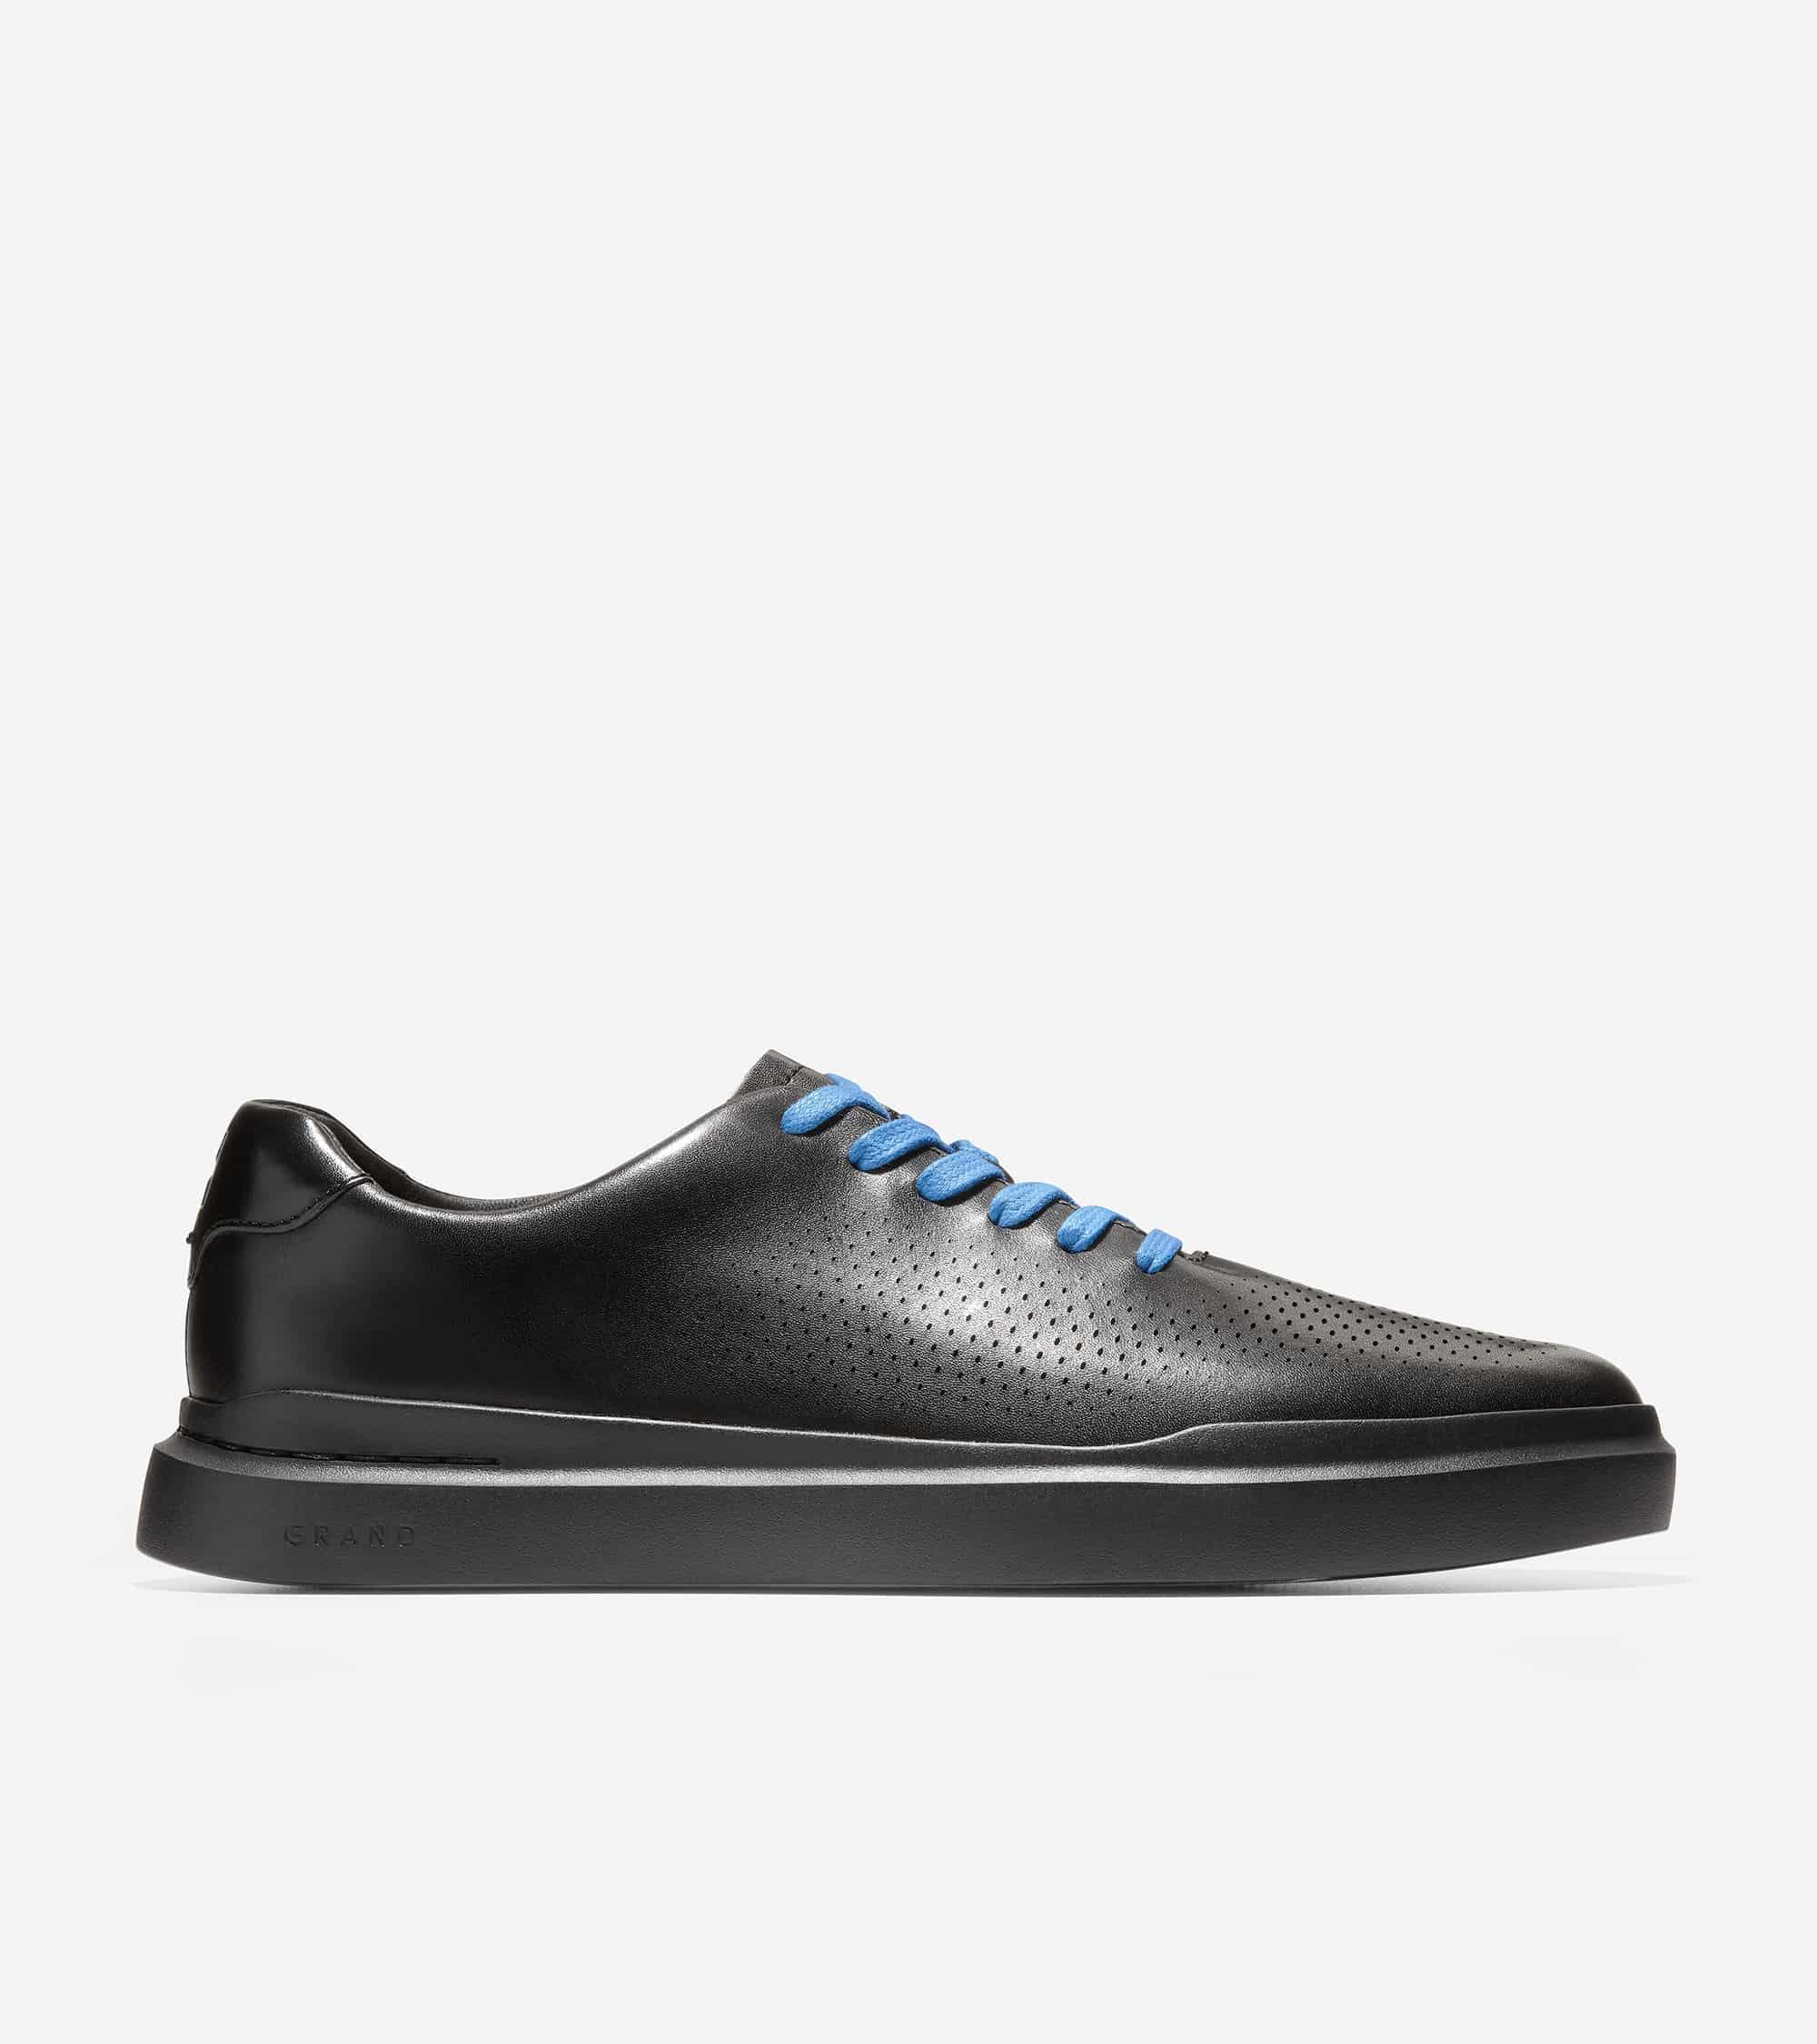 Cole Haan GrandPrø Rally Laser Cut Sneaker Black Leather /Black